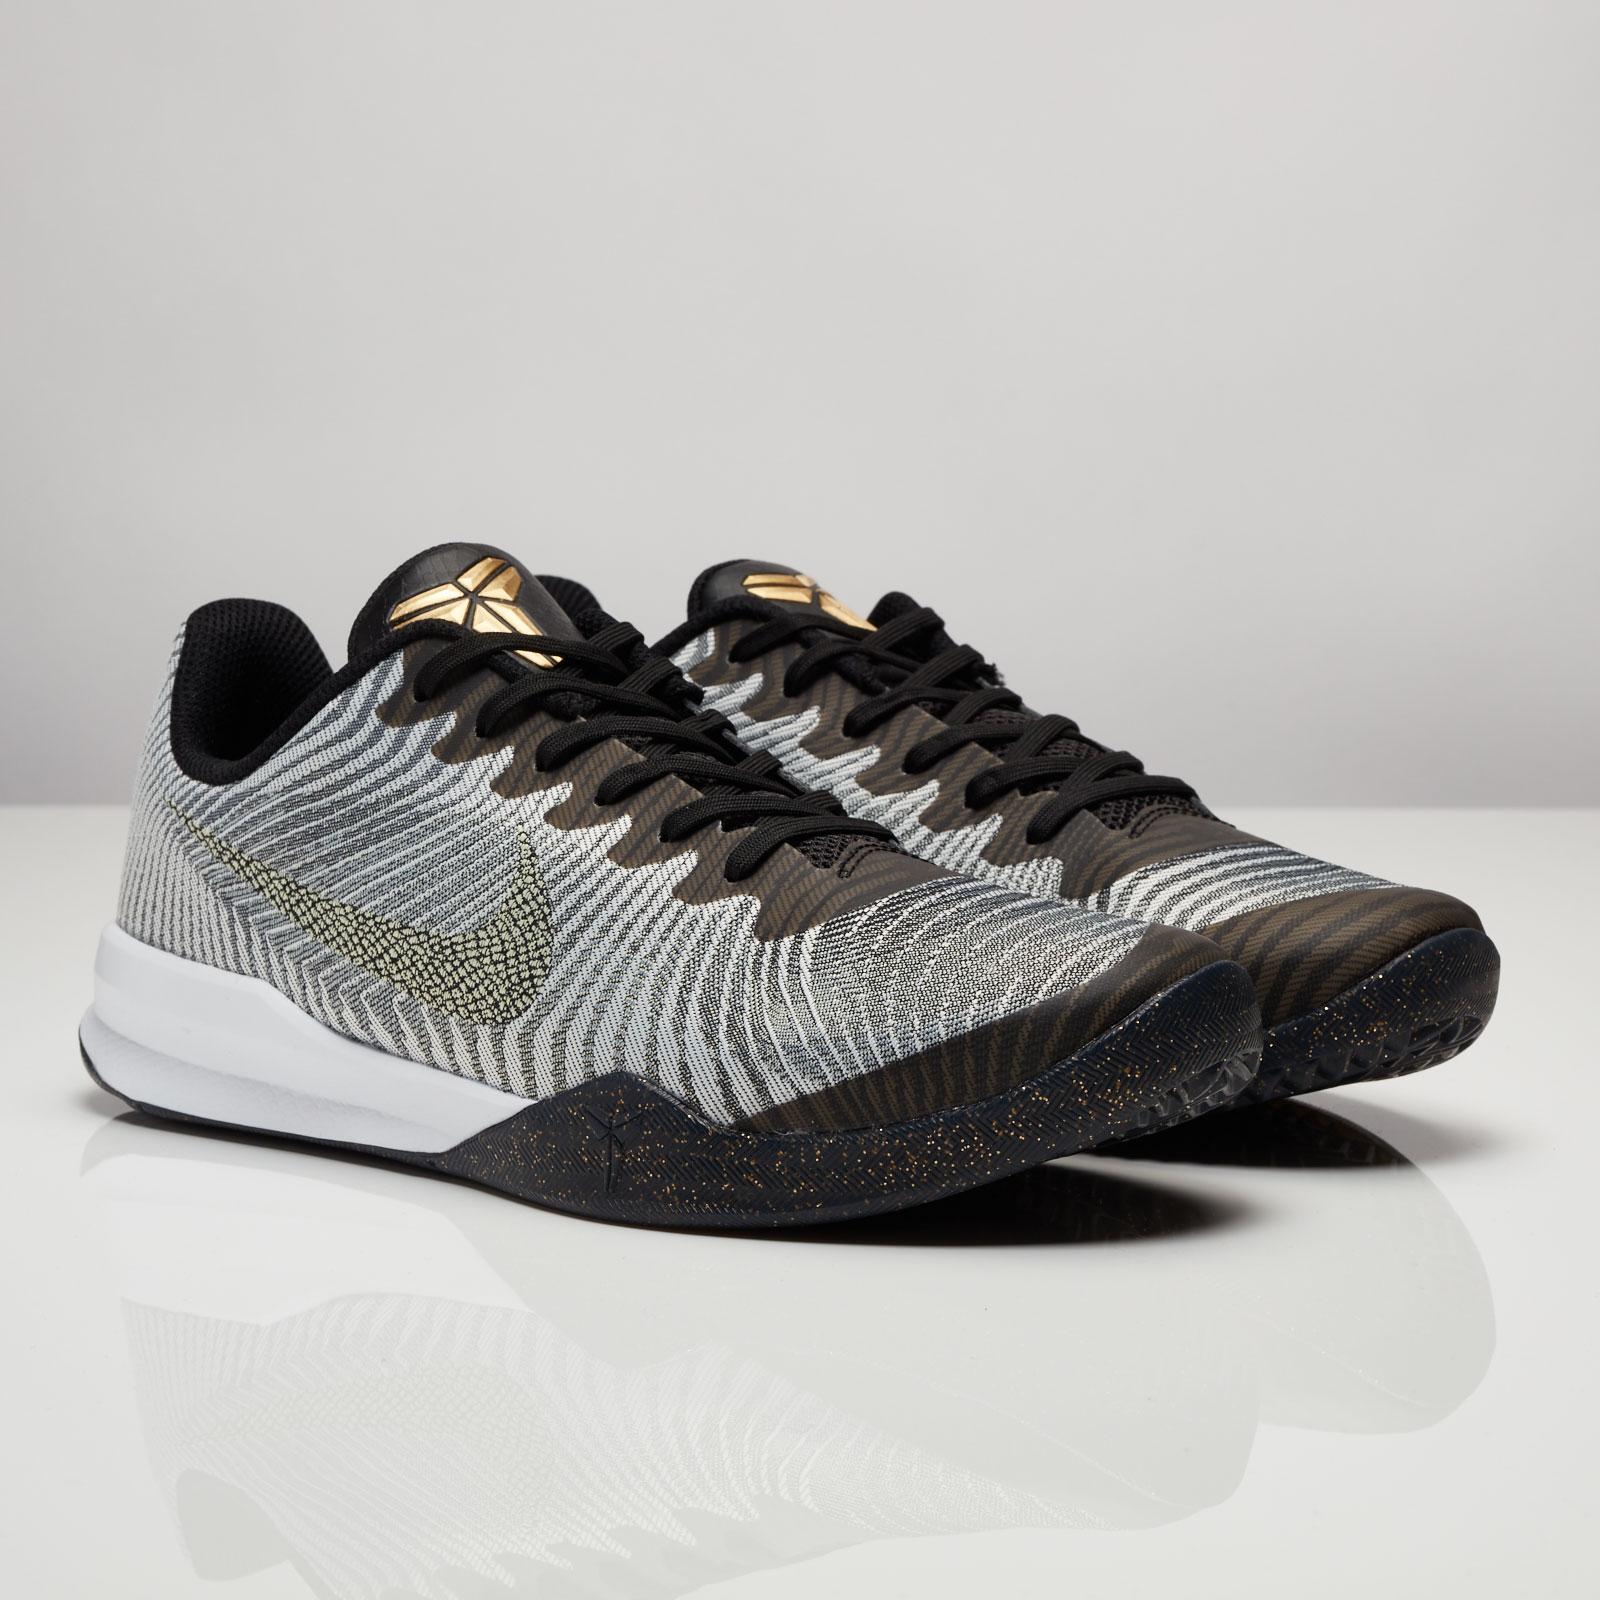 daa018f5903b Nike KB Mentality 2 - 818952-005 - Sneakersnstuff